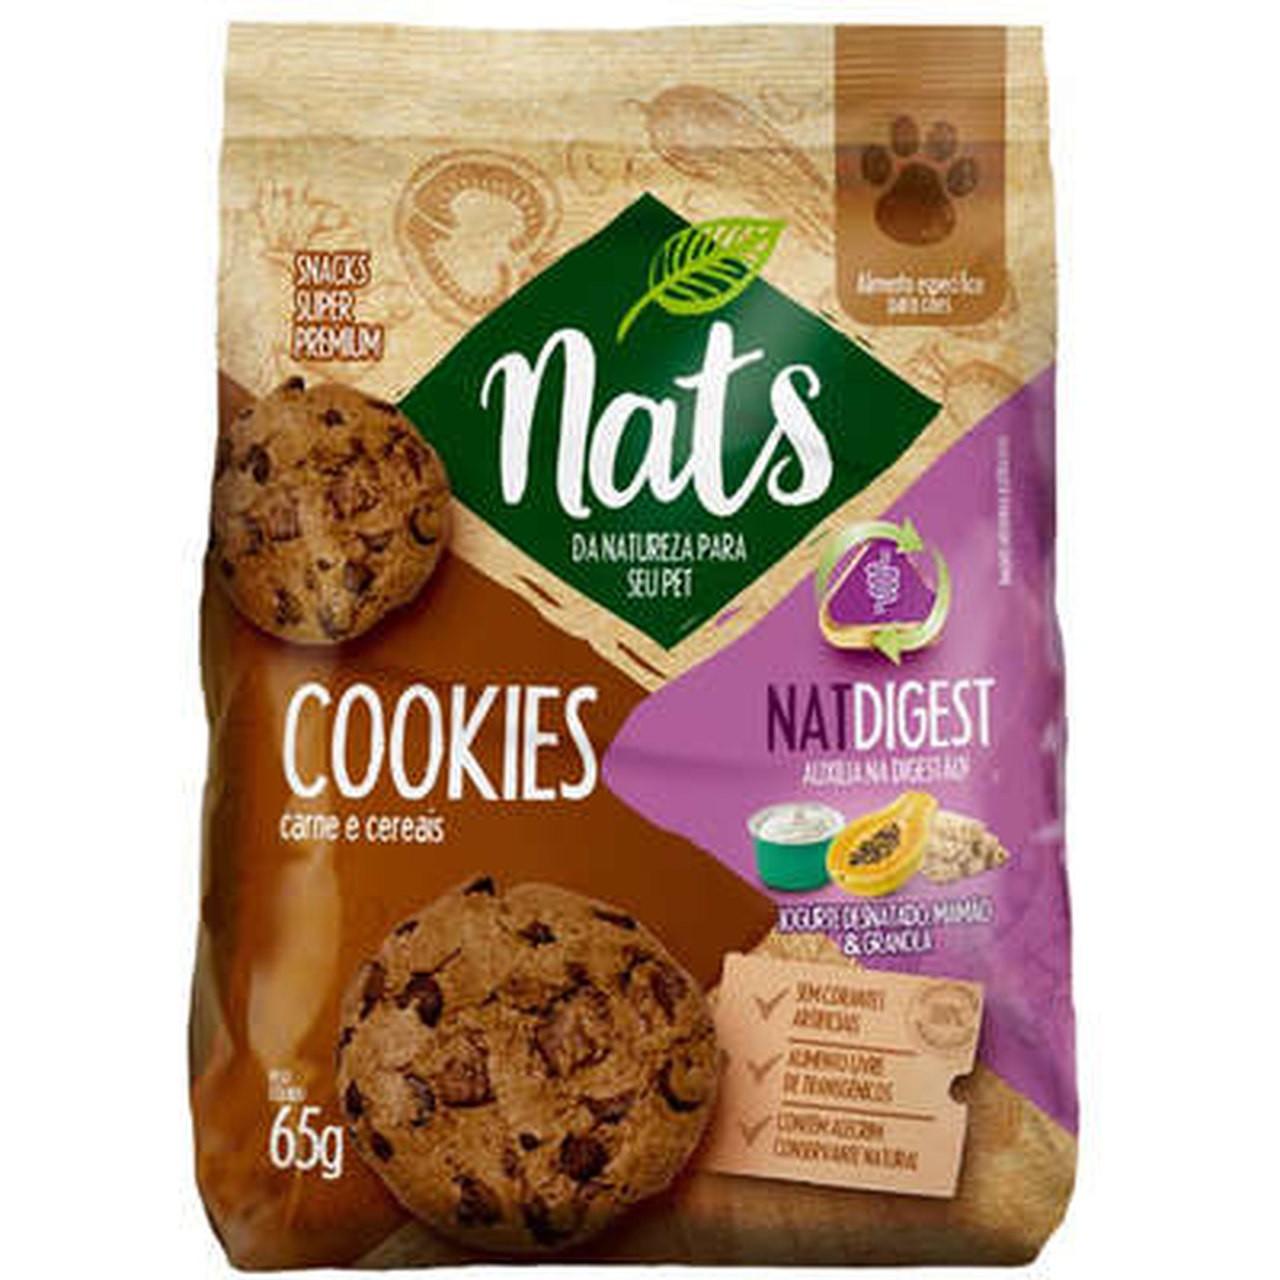 Cookies Nats NatDigest Carne e Cereais para Cães 65g